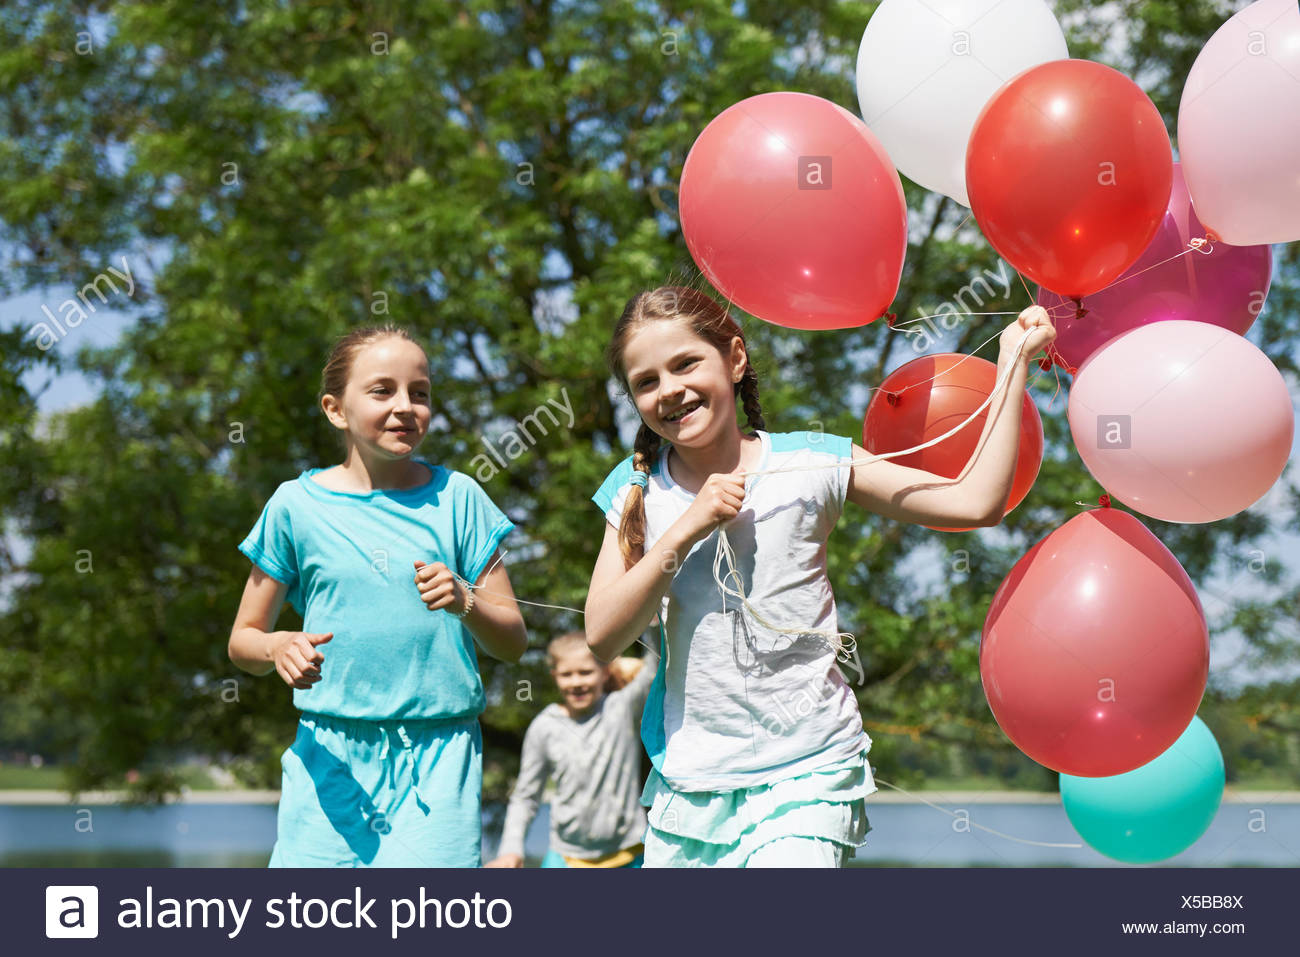 Girls running in park with balloons, Lake Karlsfeld, Munich, Bavaria, Germany - Stock Image